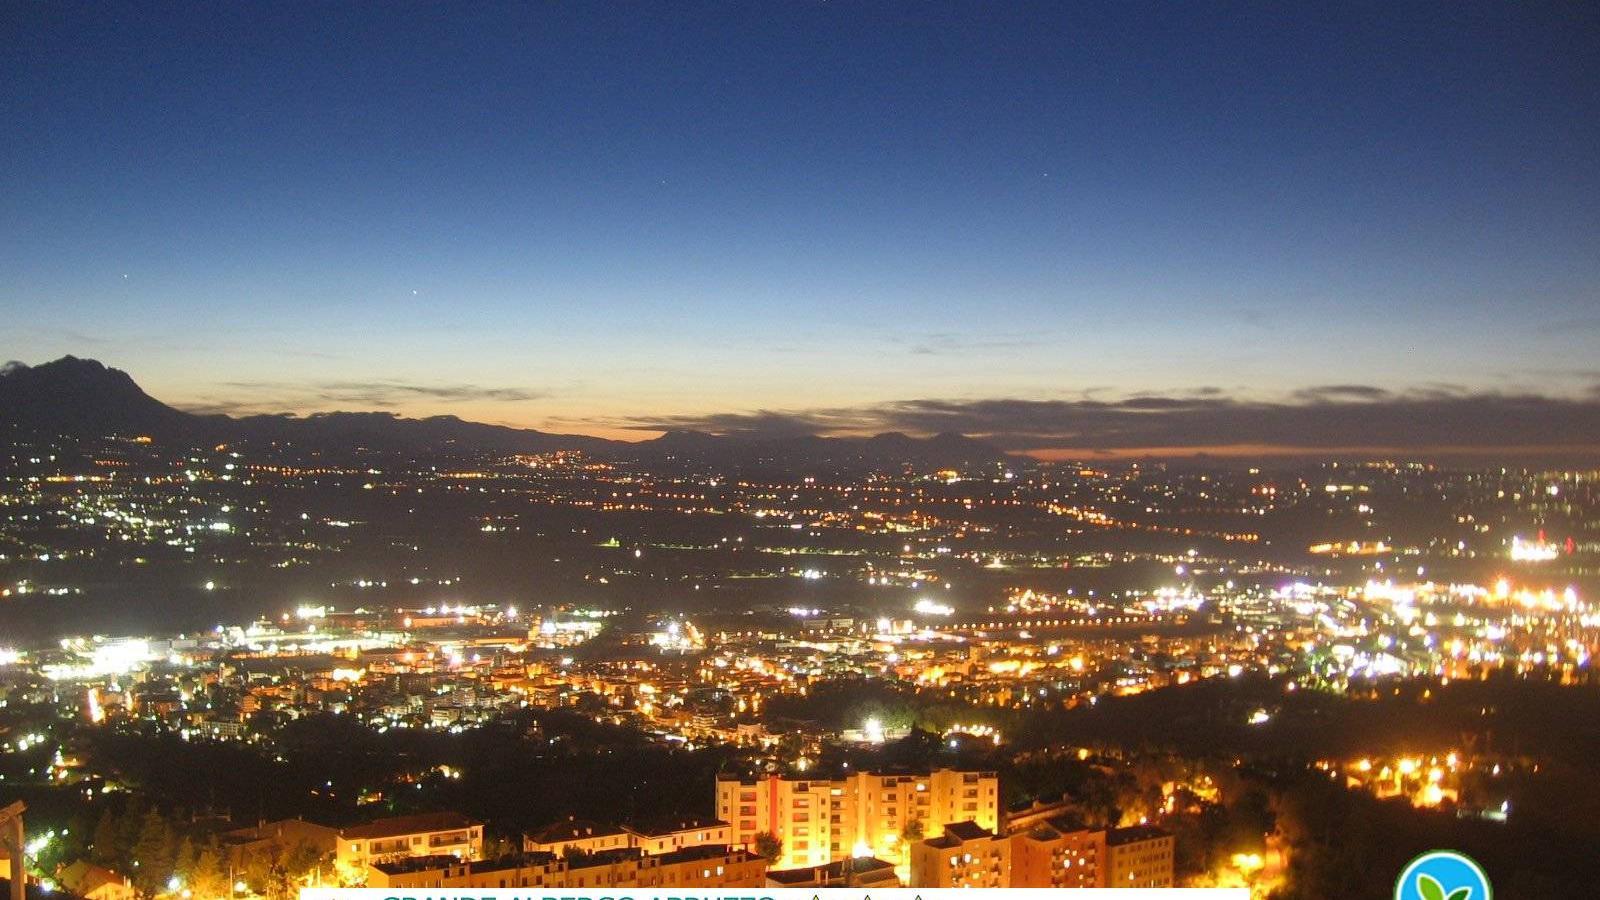 Webkamera Grande Albergo Abruzzo › North-West: Grande Alberg